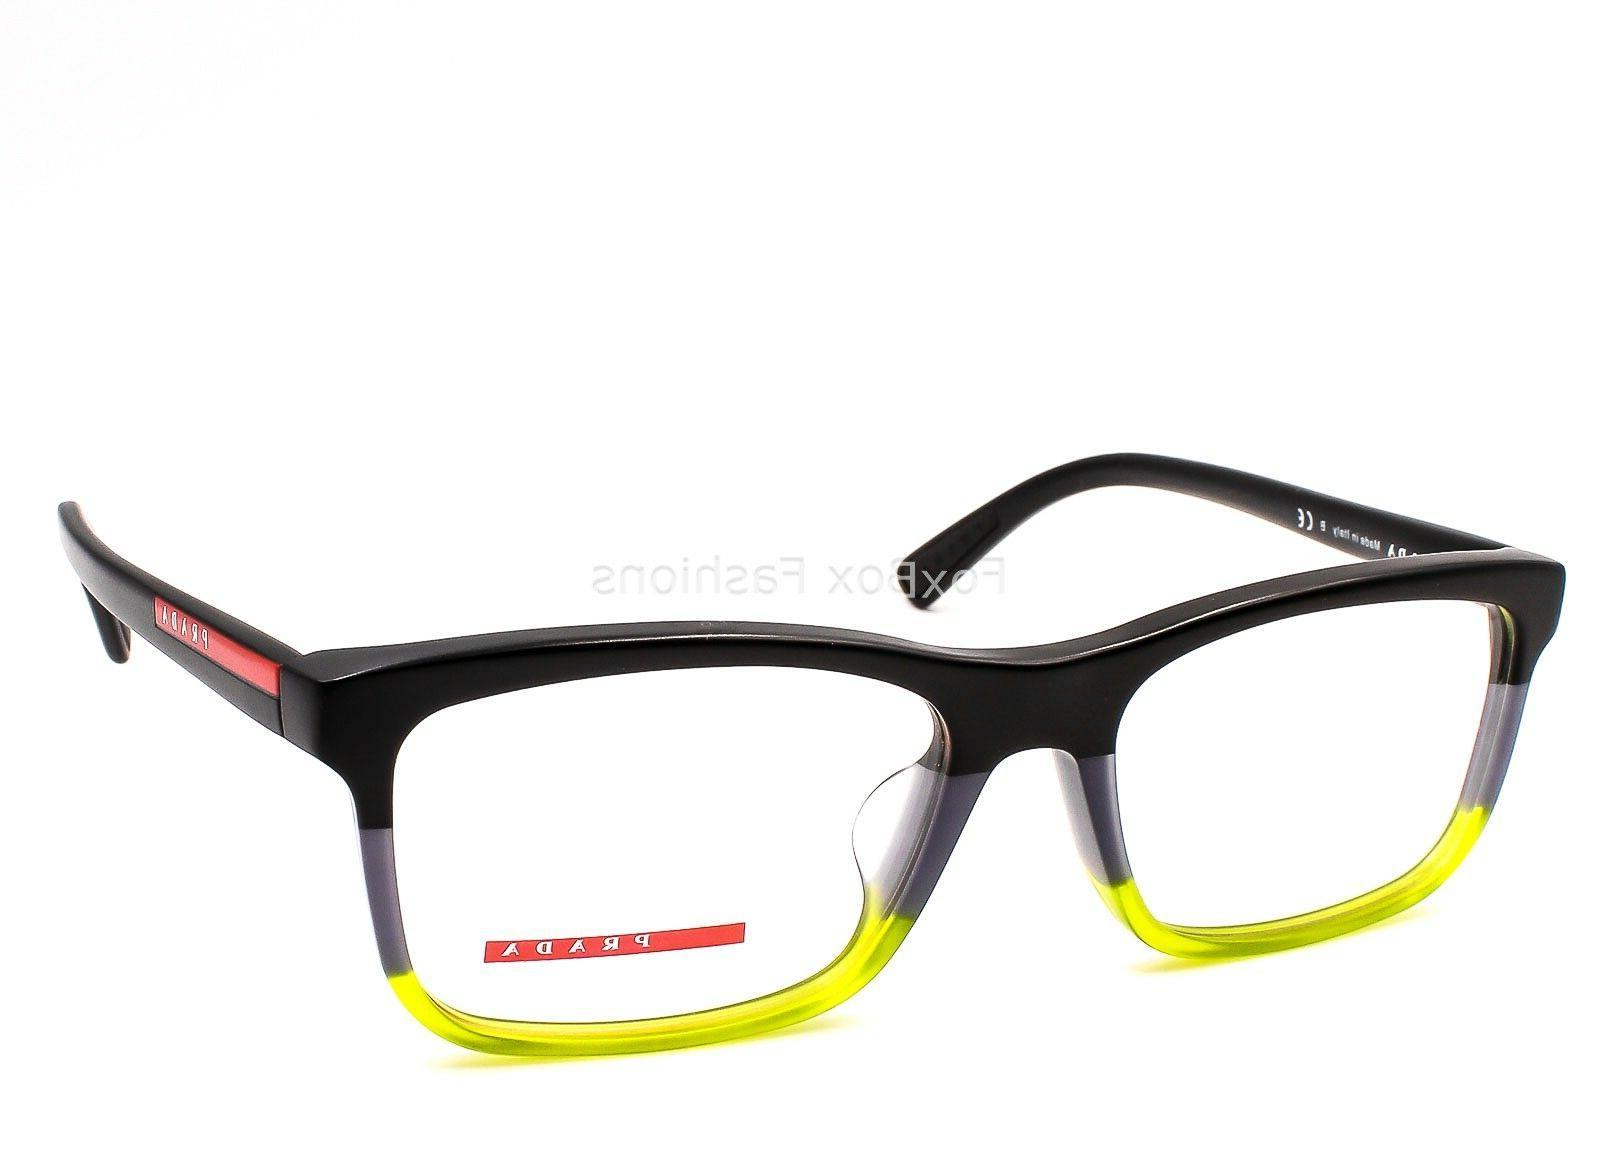 PRADA SPORT 05F F TWU 1O1 Eyeglasses Glasses Black ~ Gray ~